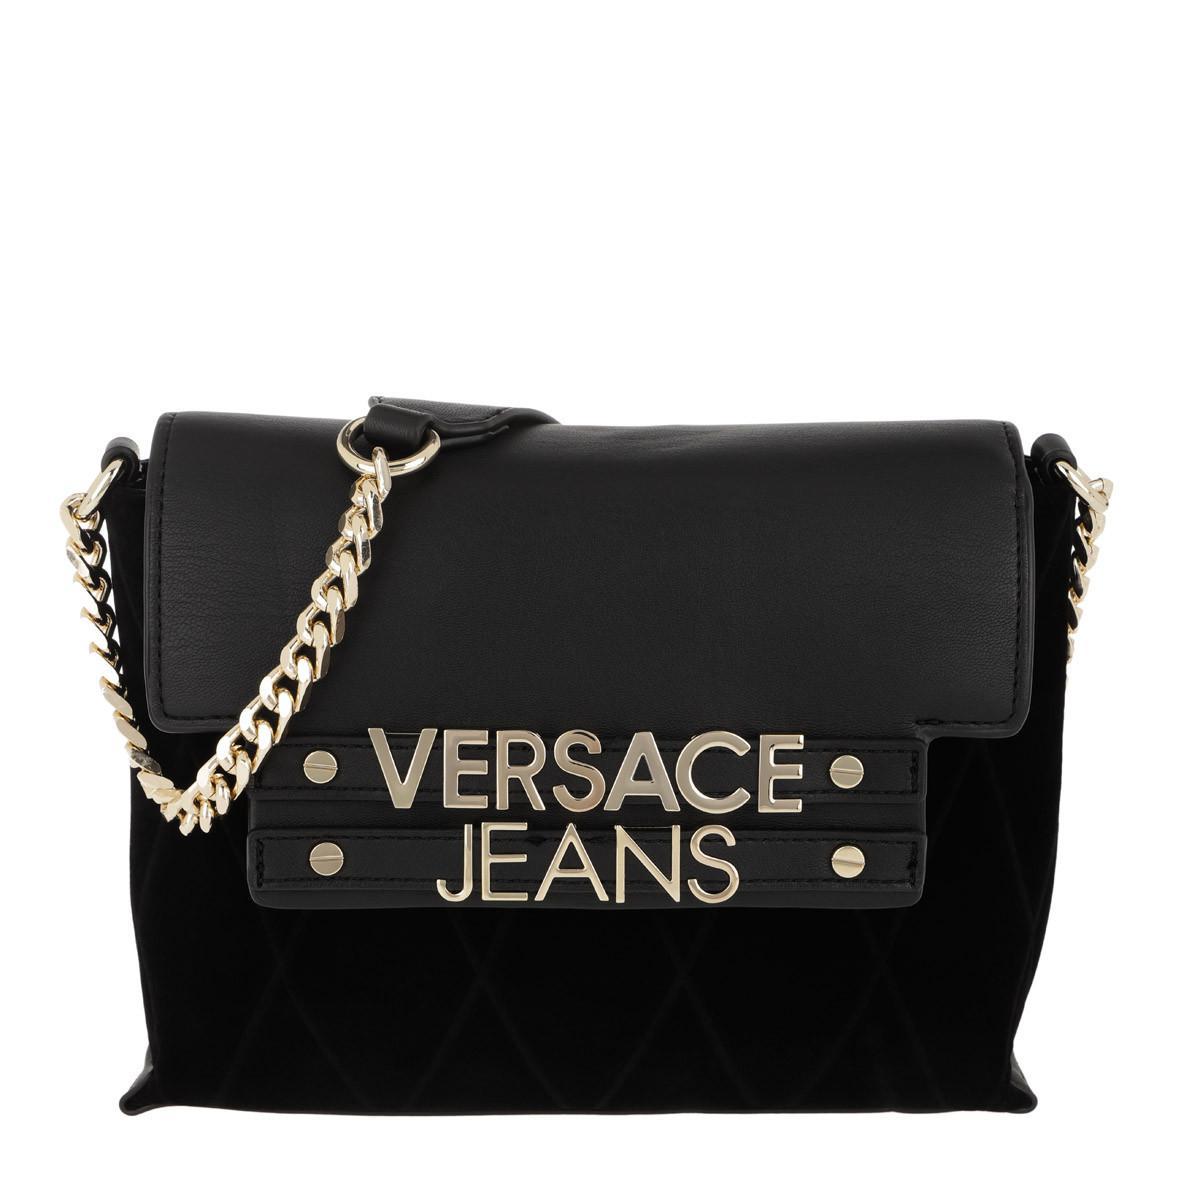 Versace Jeans Logo Chain Crossbody Bag Black in Black - Lyst 0078a53567d68